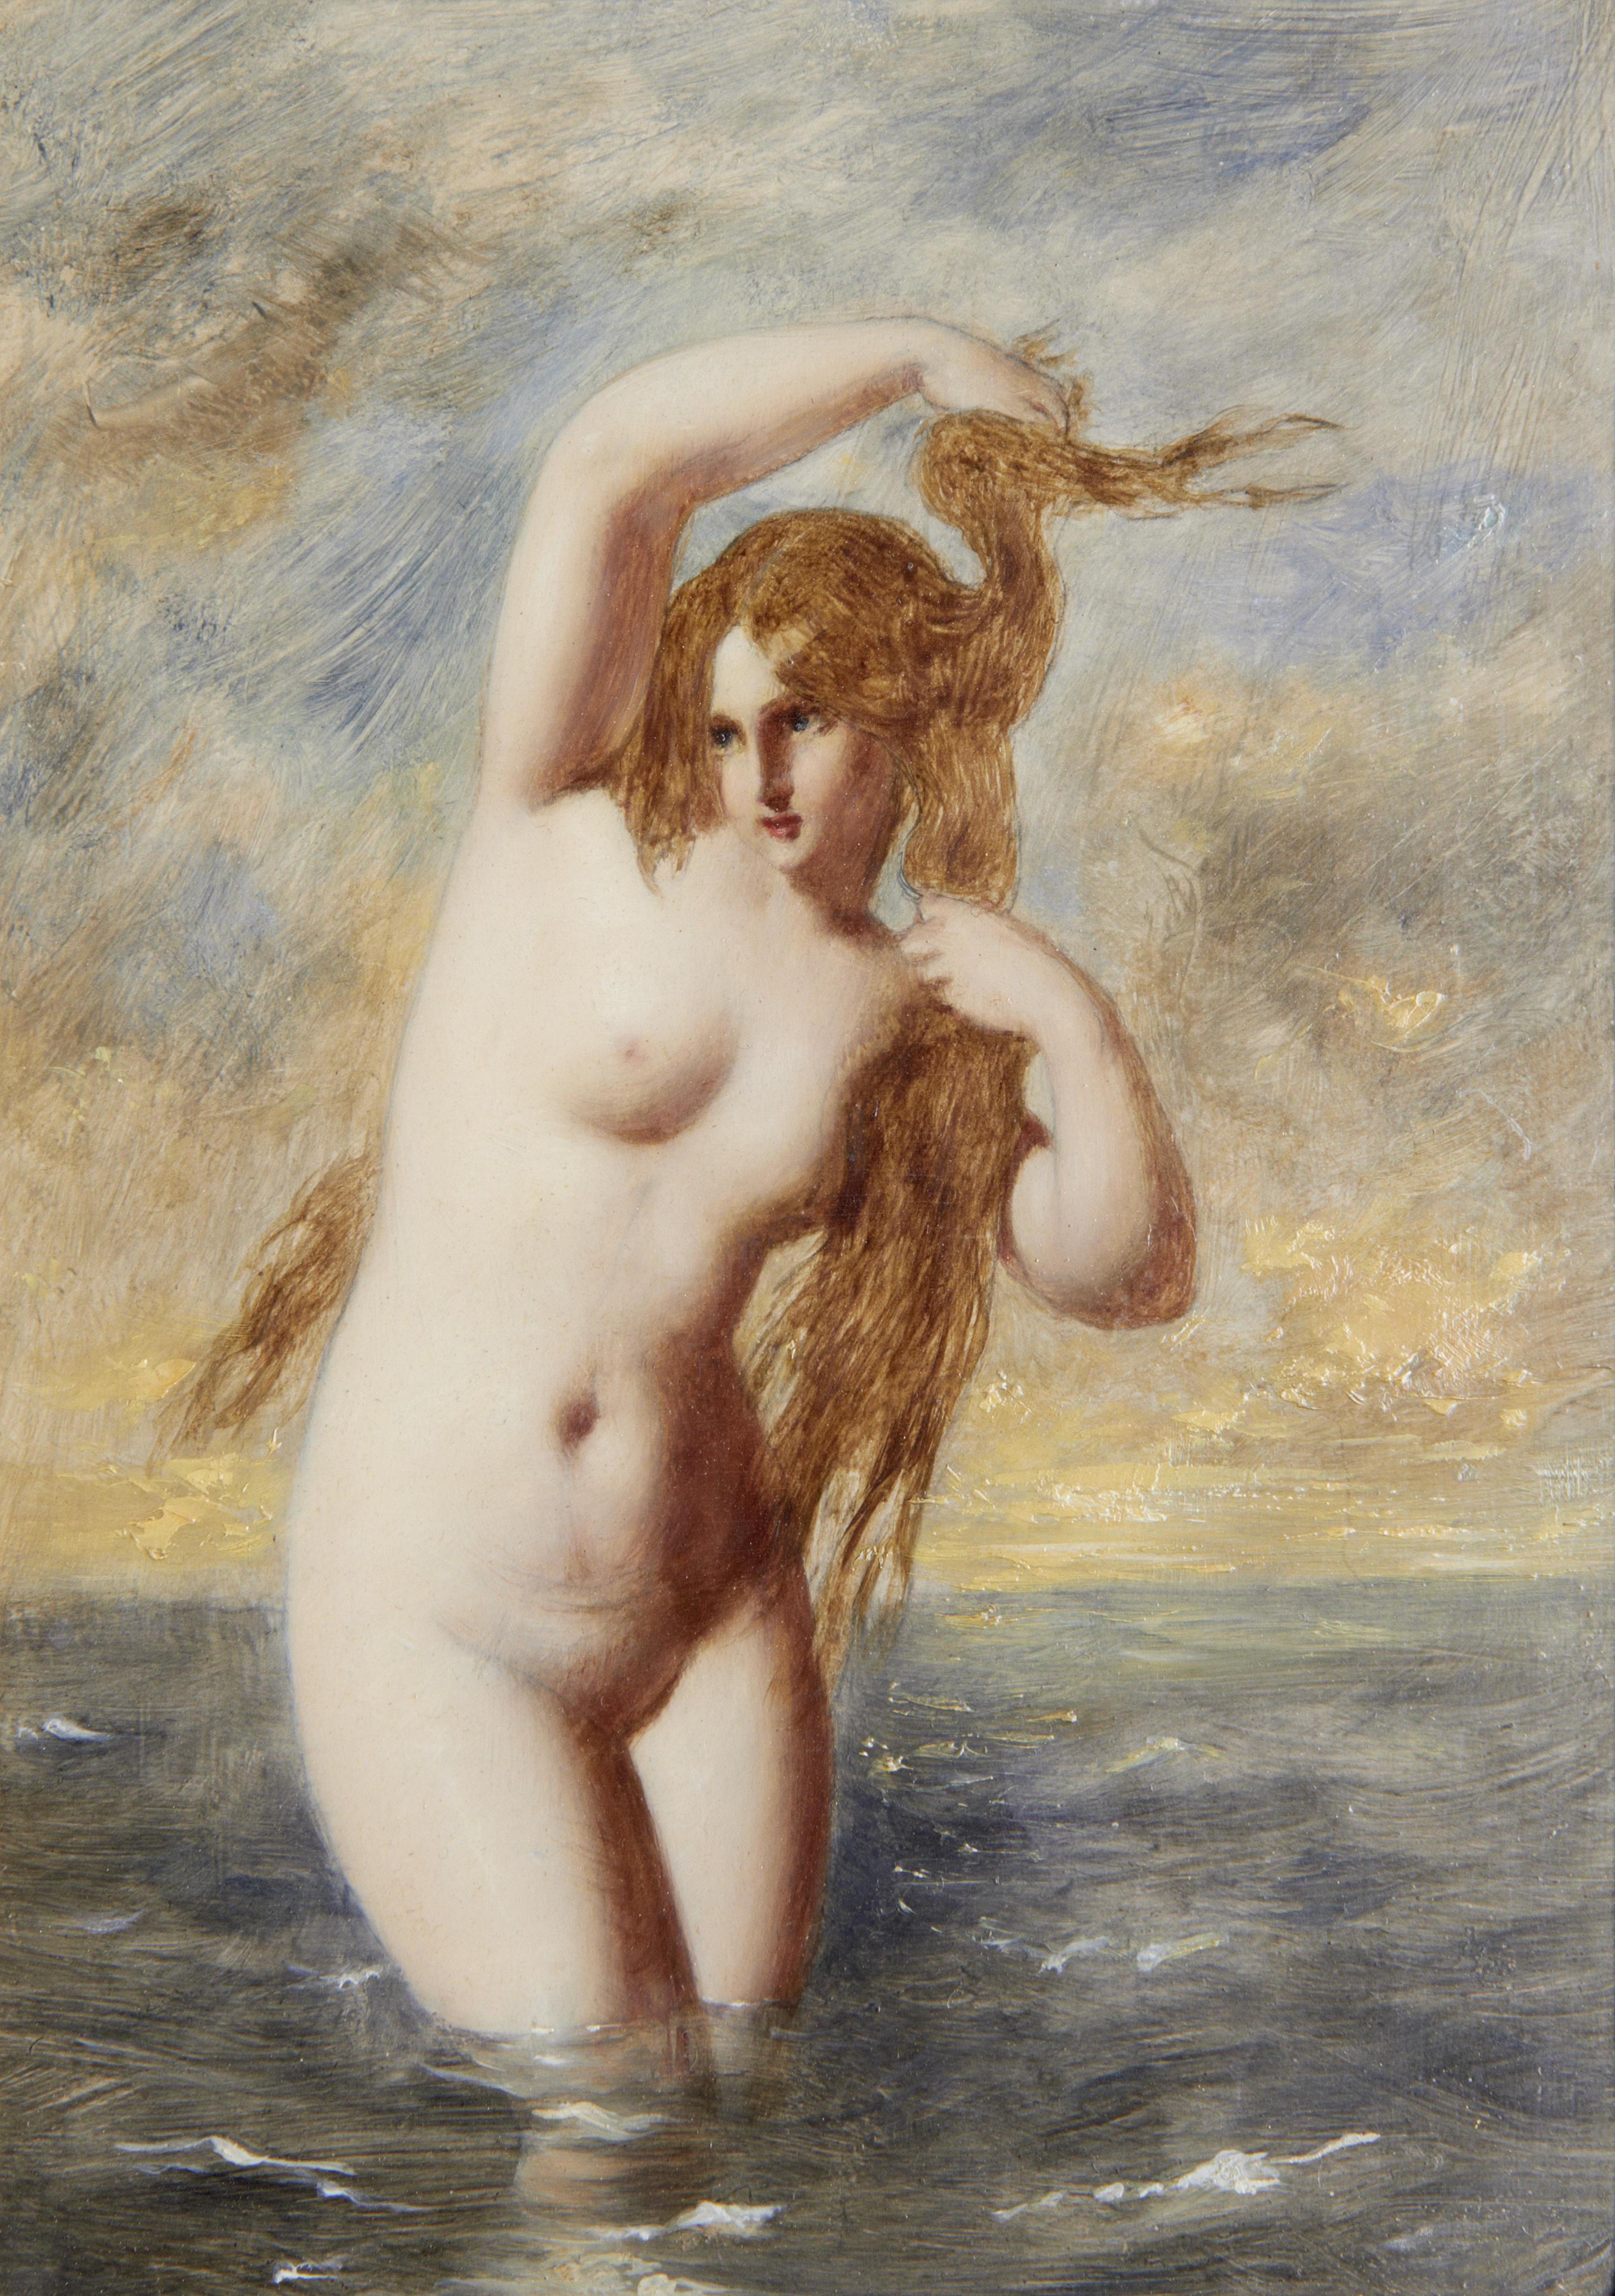 William Edward Frost, 1810-1877. Сирена. 23.5 x 17 см. частная коллекция